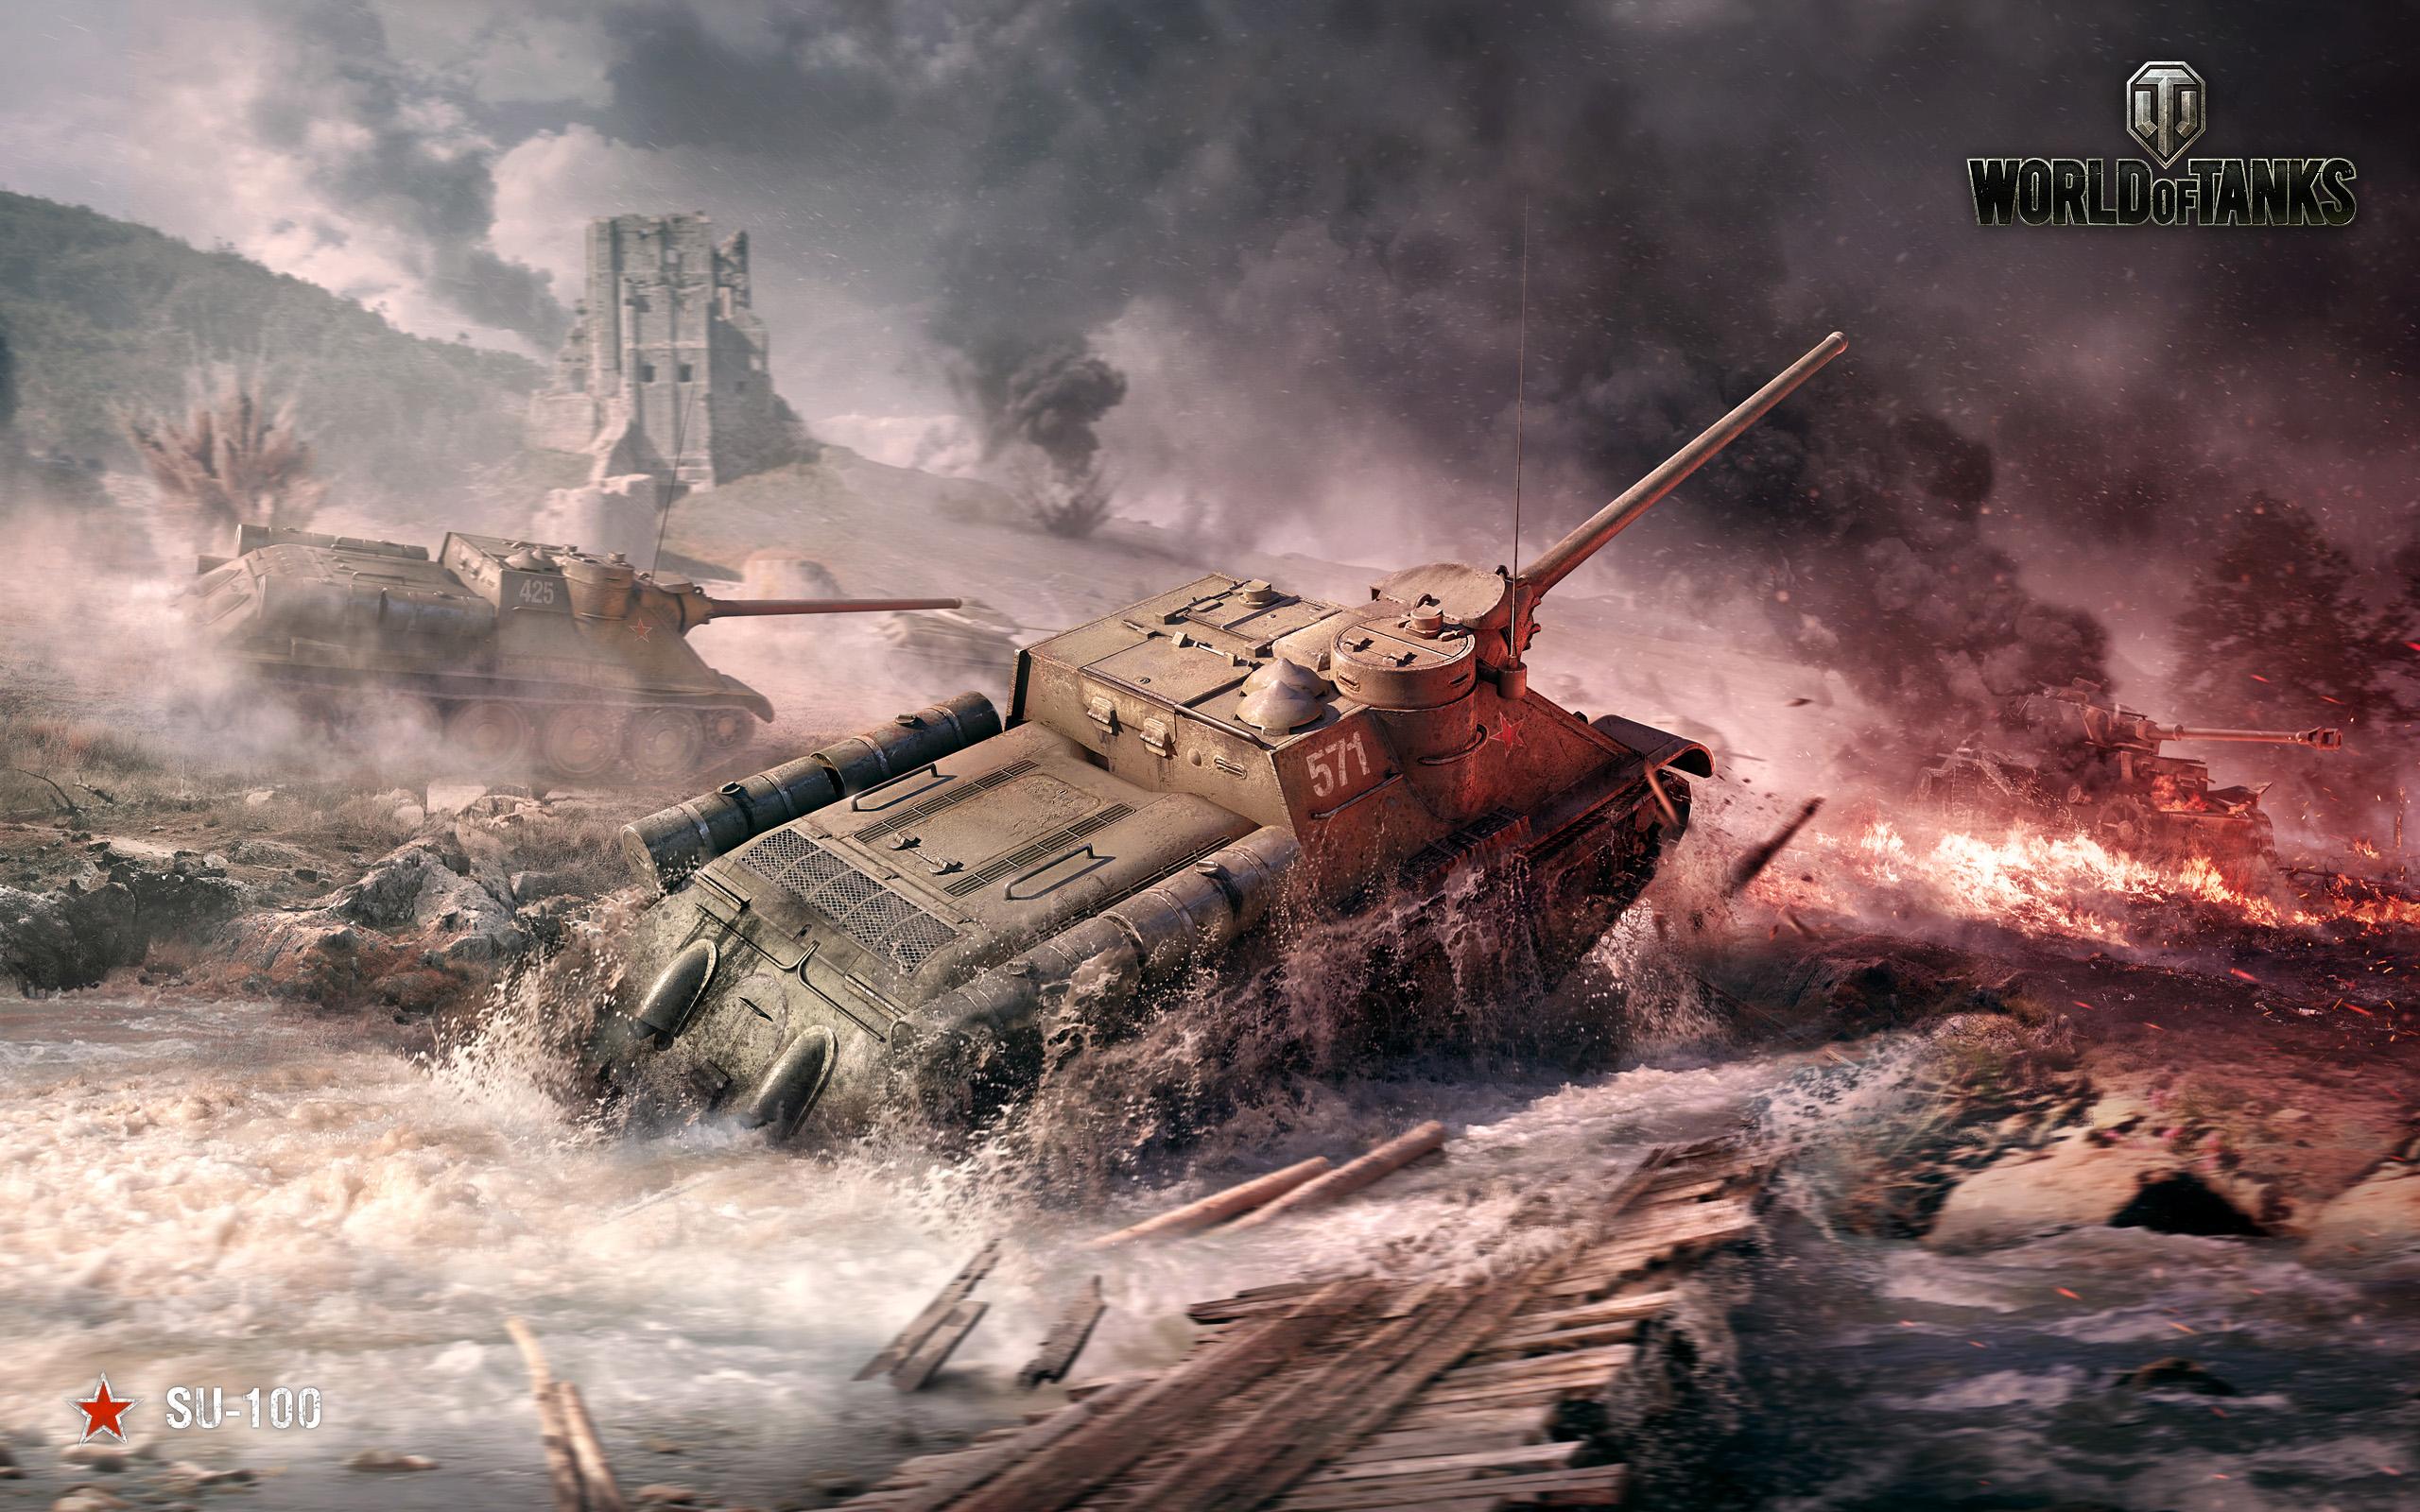 HD Wallpapers SU 100 World of Tanks